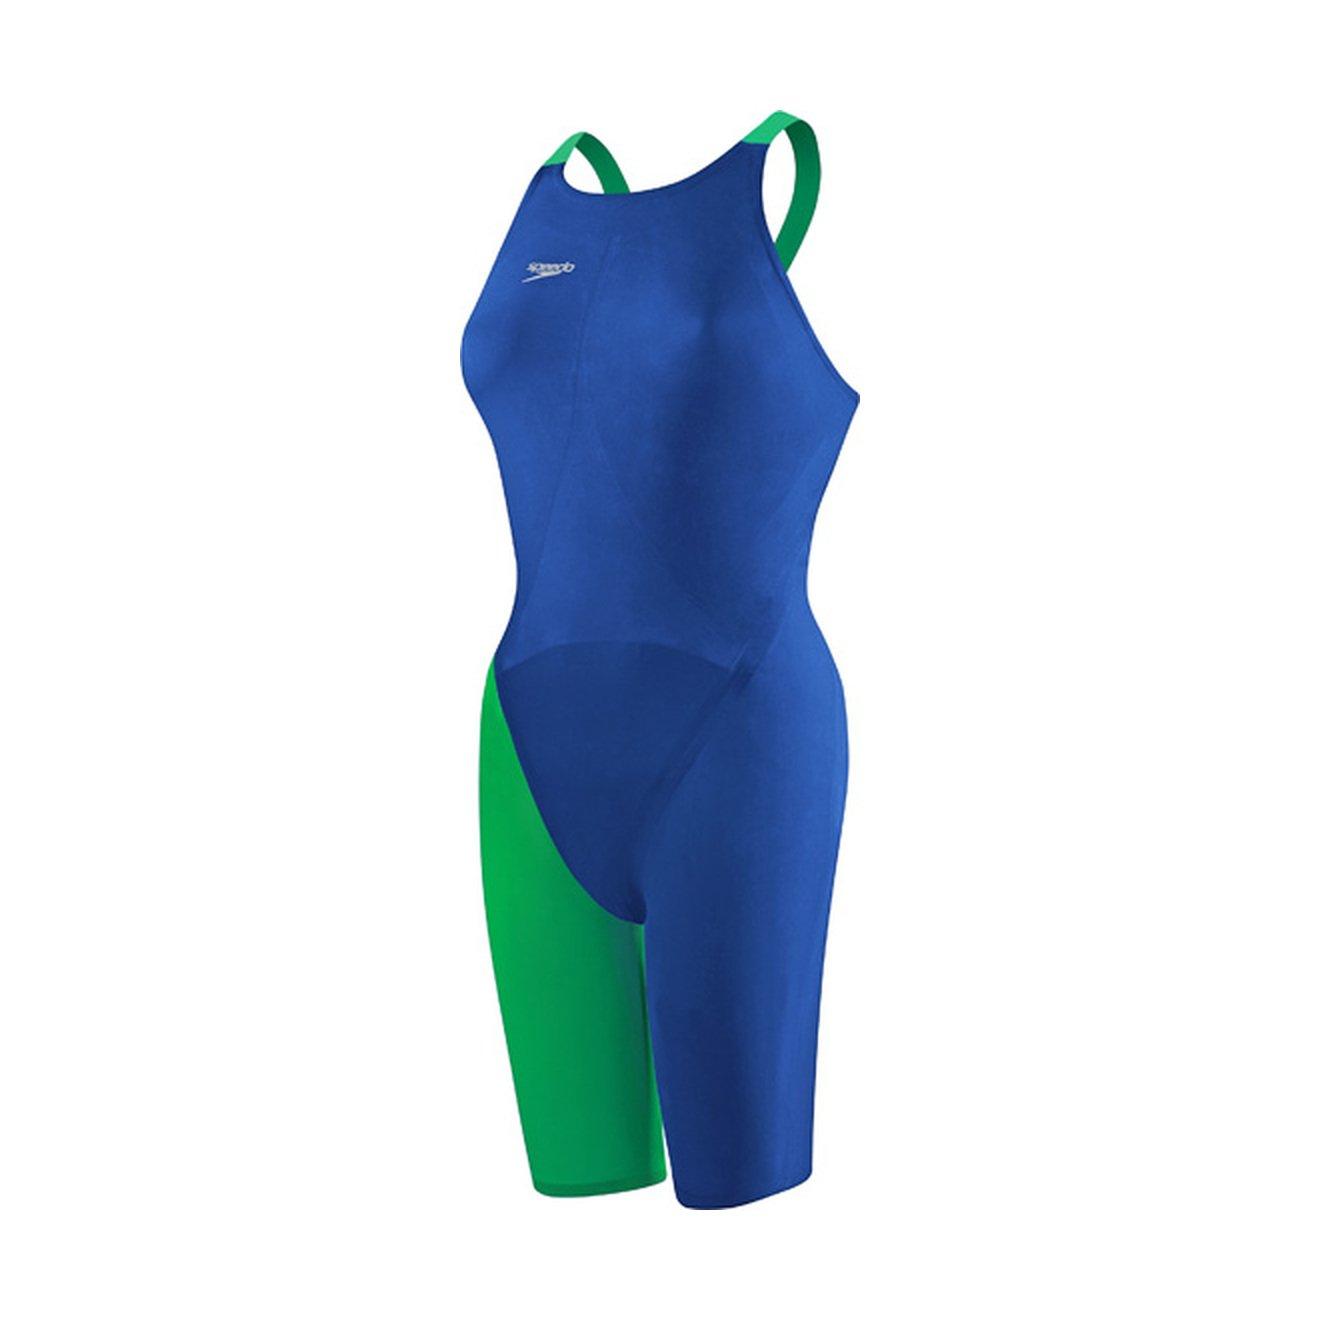 Speedo 7190722レディースLZRエリート2 Closed Back Swimsuit B016R9CPUK ブルー/グリーン 25 25 ブルー/グリーン